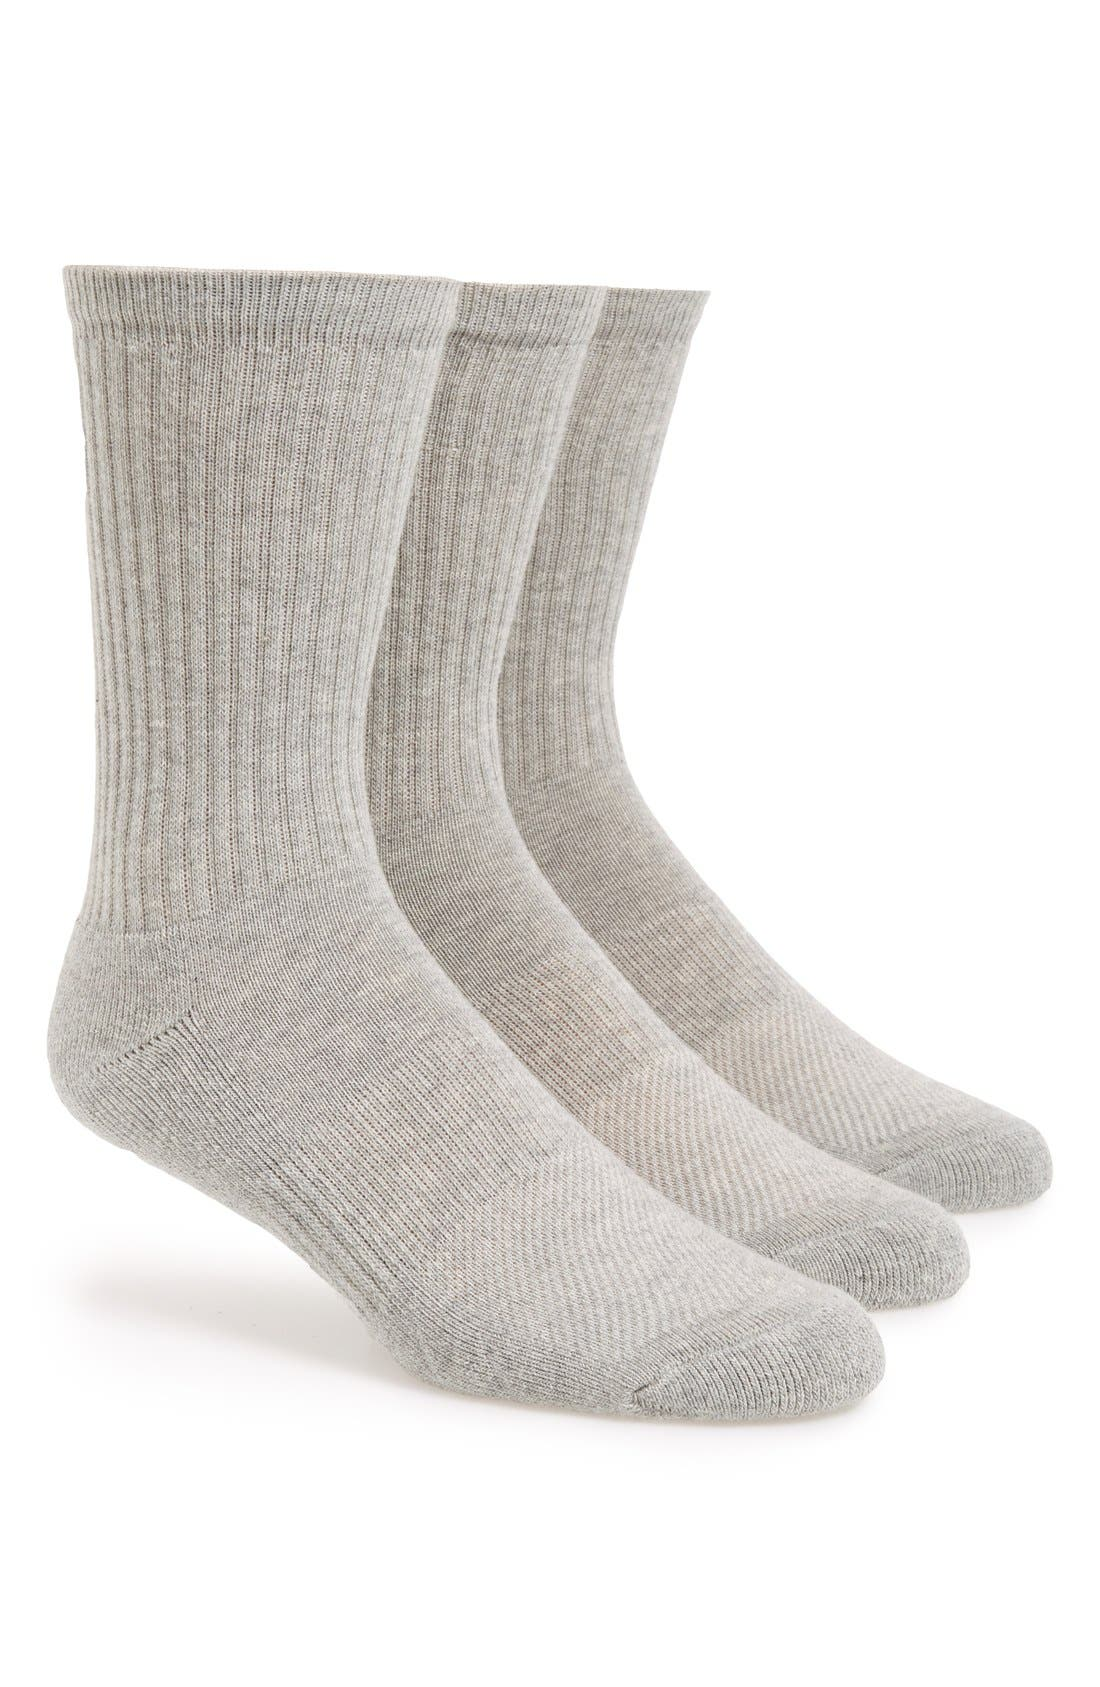 Nordstrom Men's Shop 3-Pack Athletic Socks (3 for $30)